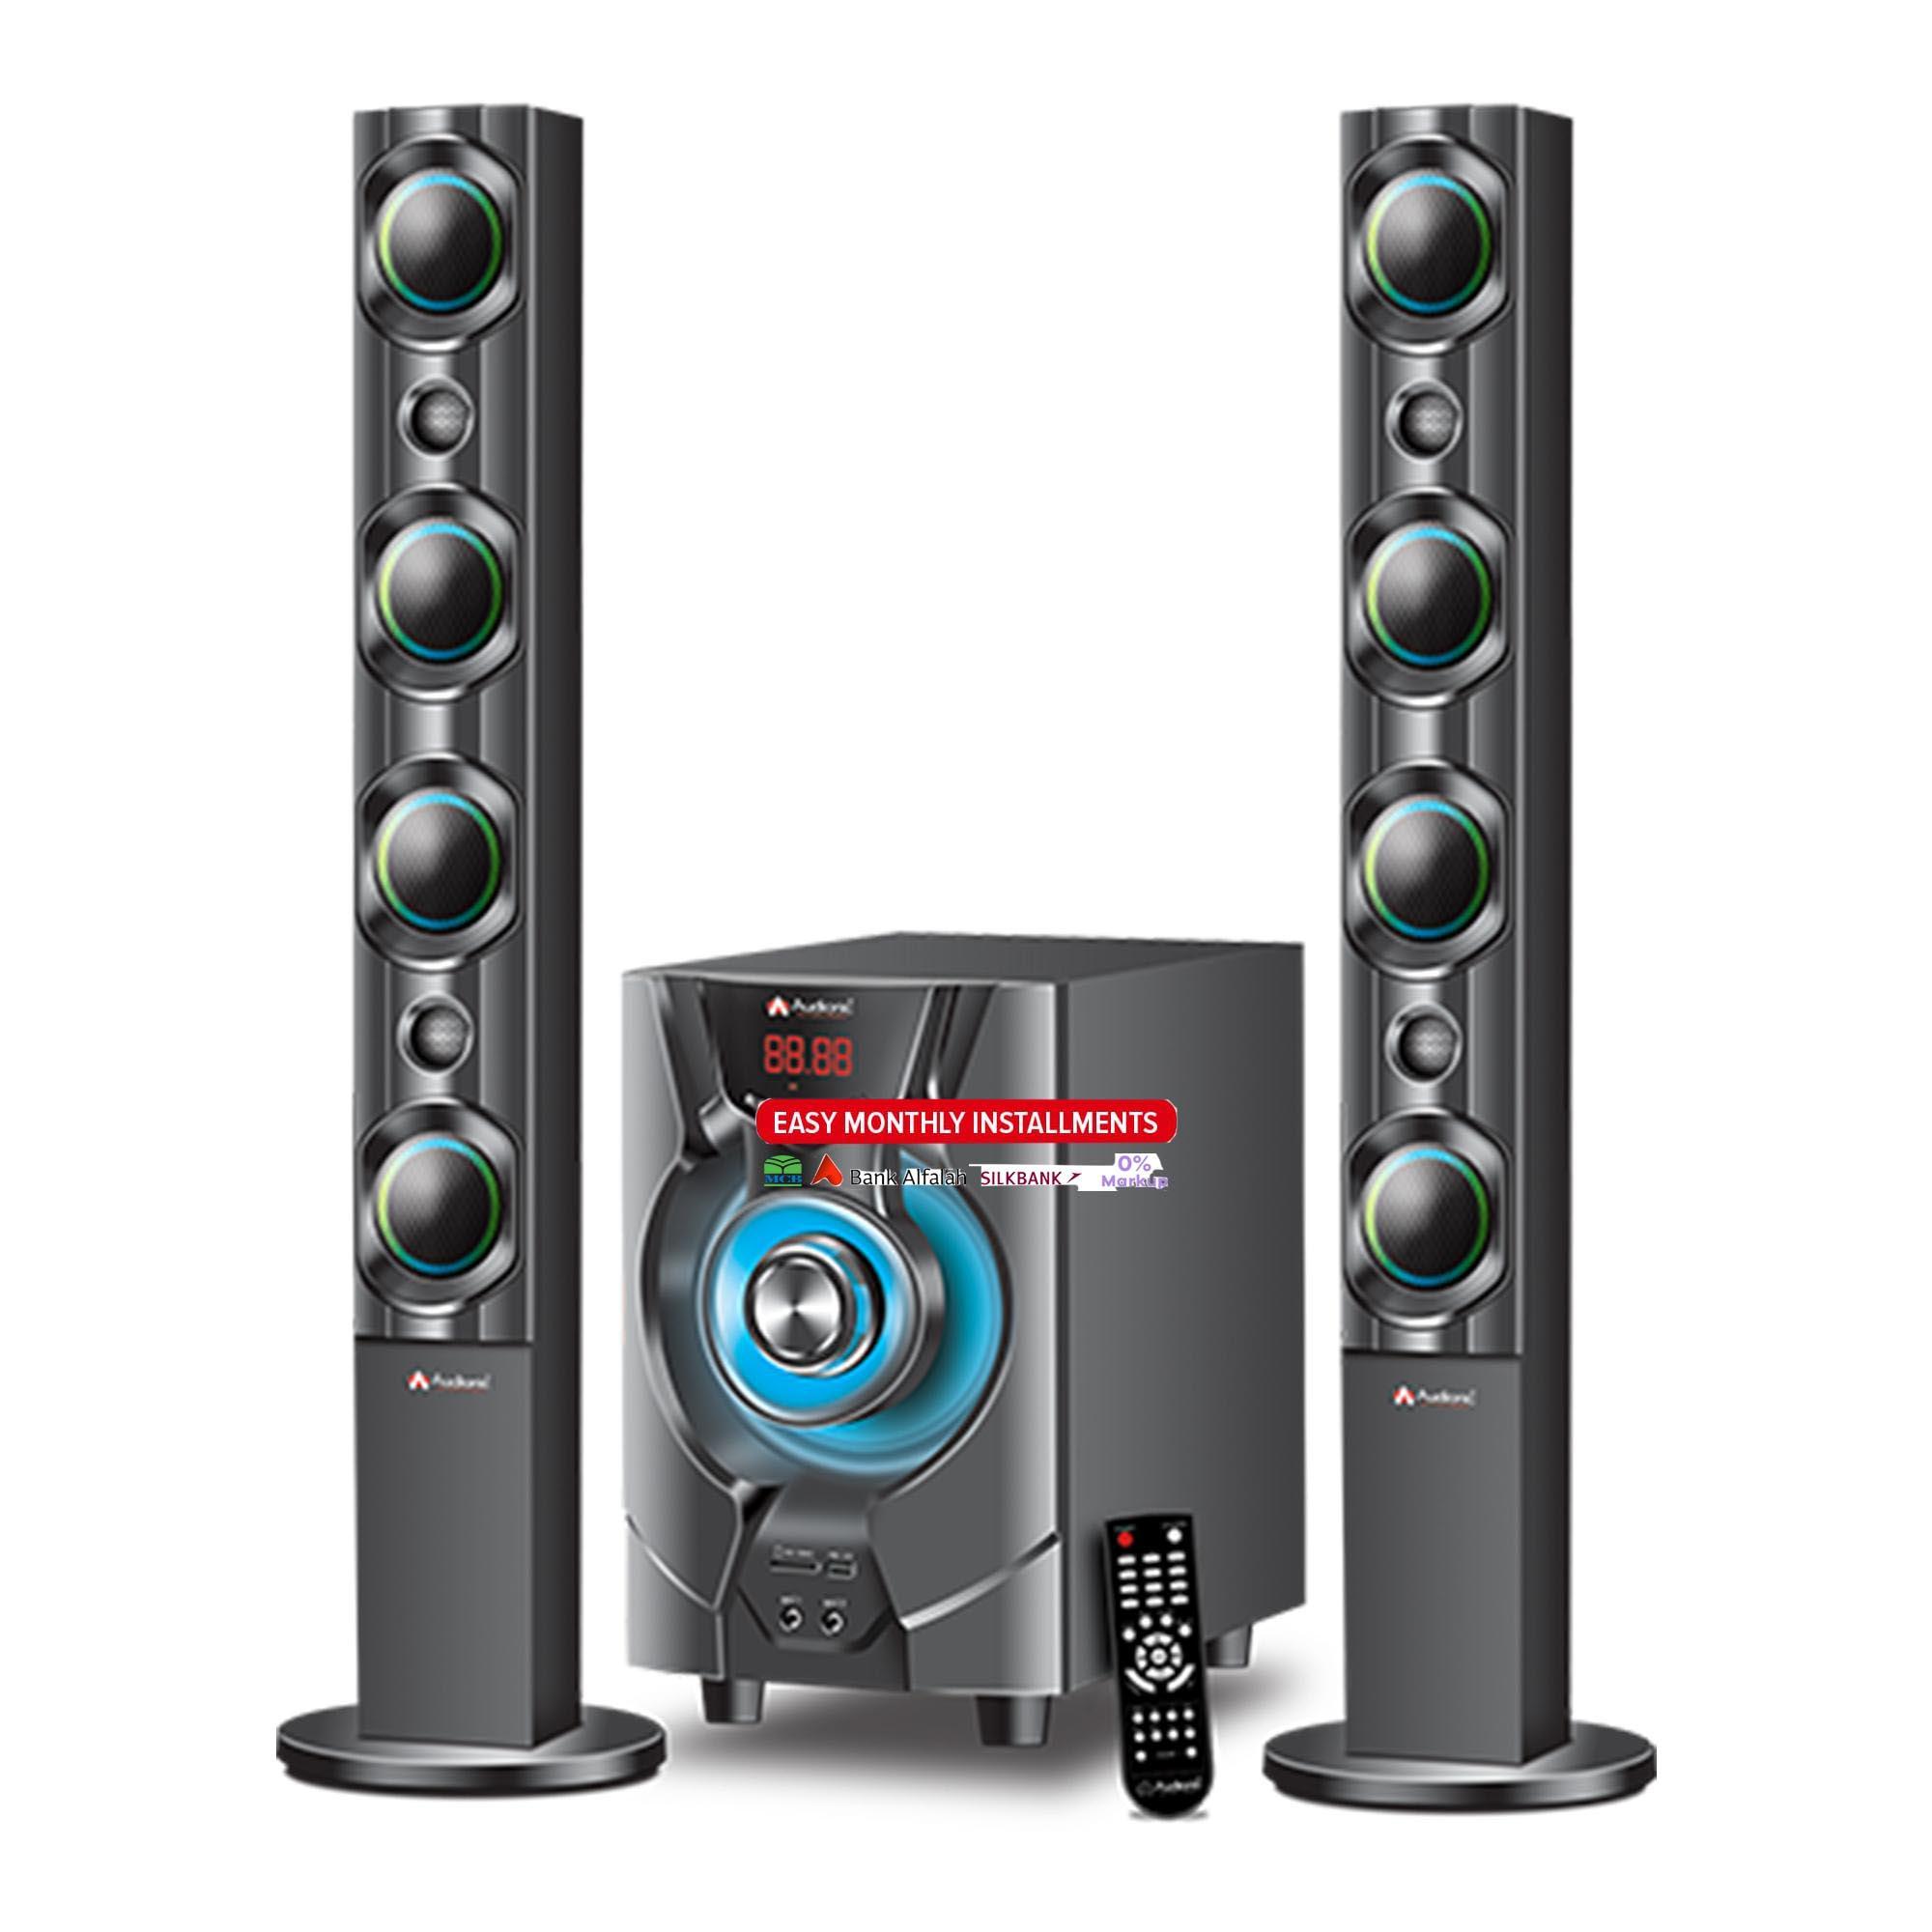 Audionic Reborn Rb 110 2 1 Channel Speakers Black Buy Online At Best Prices In Pakistan Daraz Pk